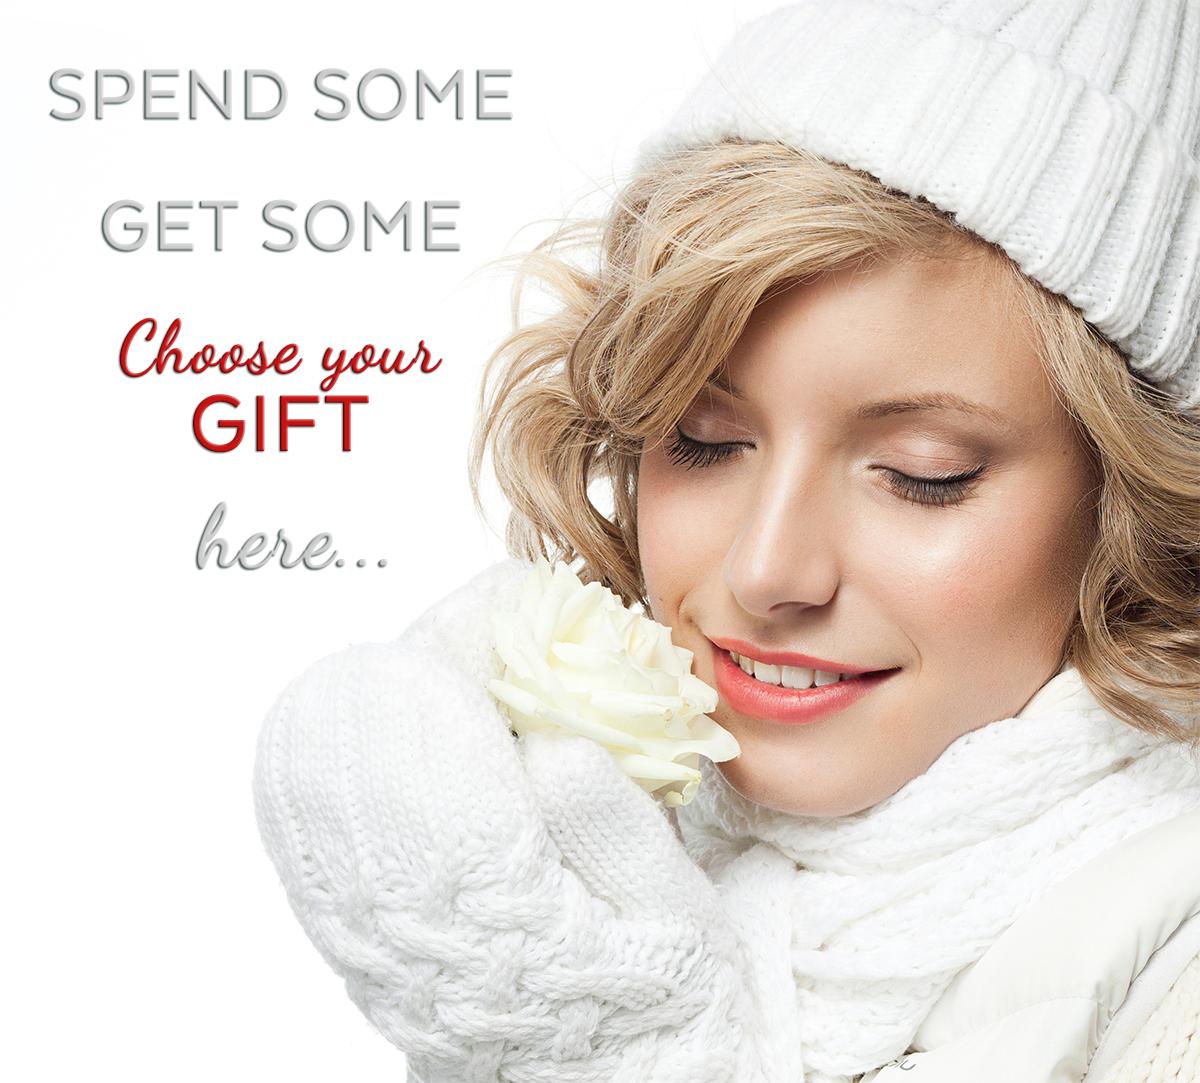 choose-gift-2.jpg